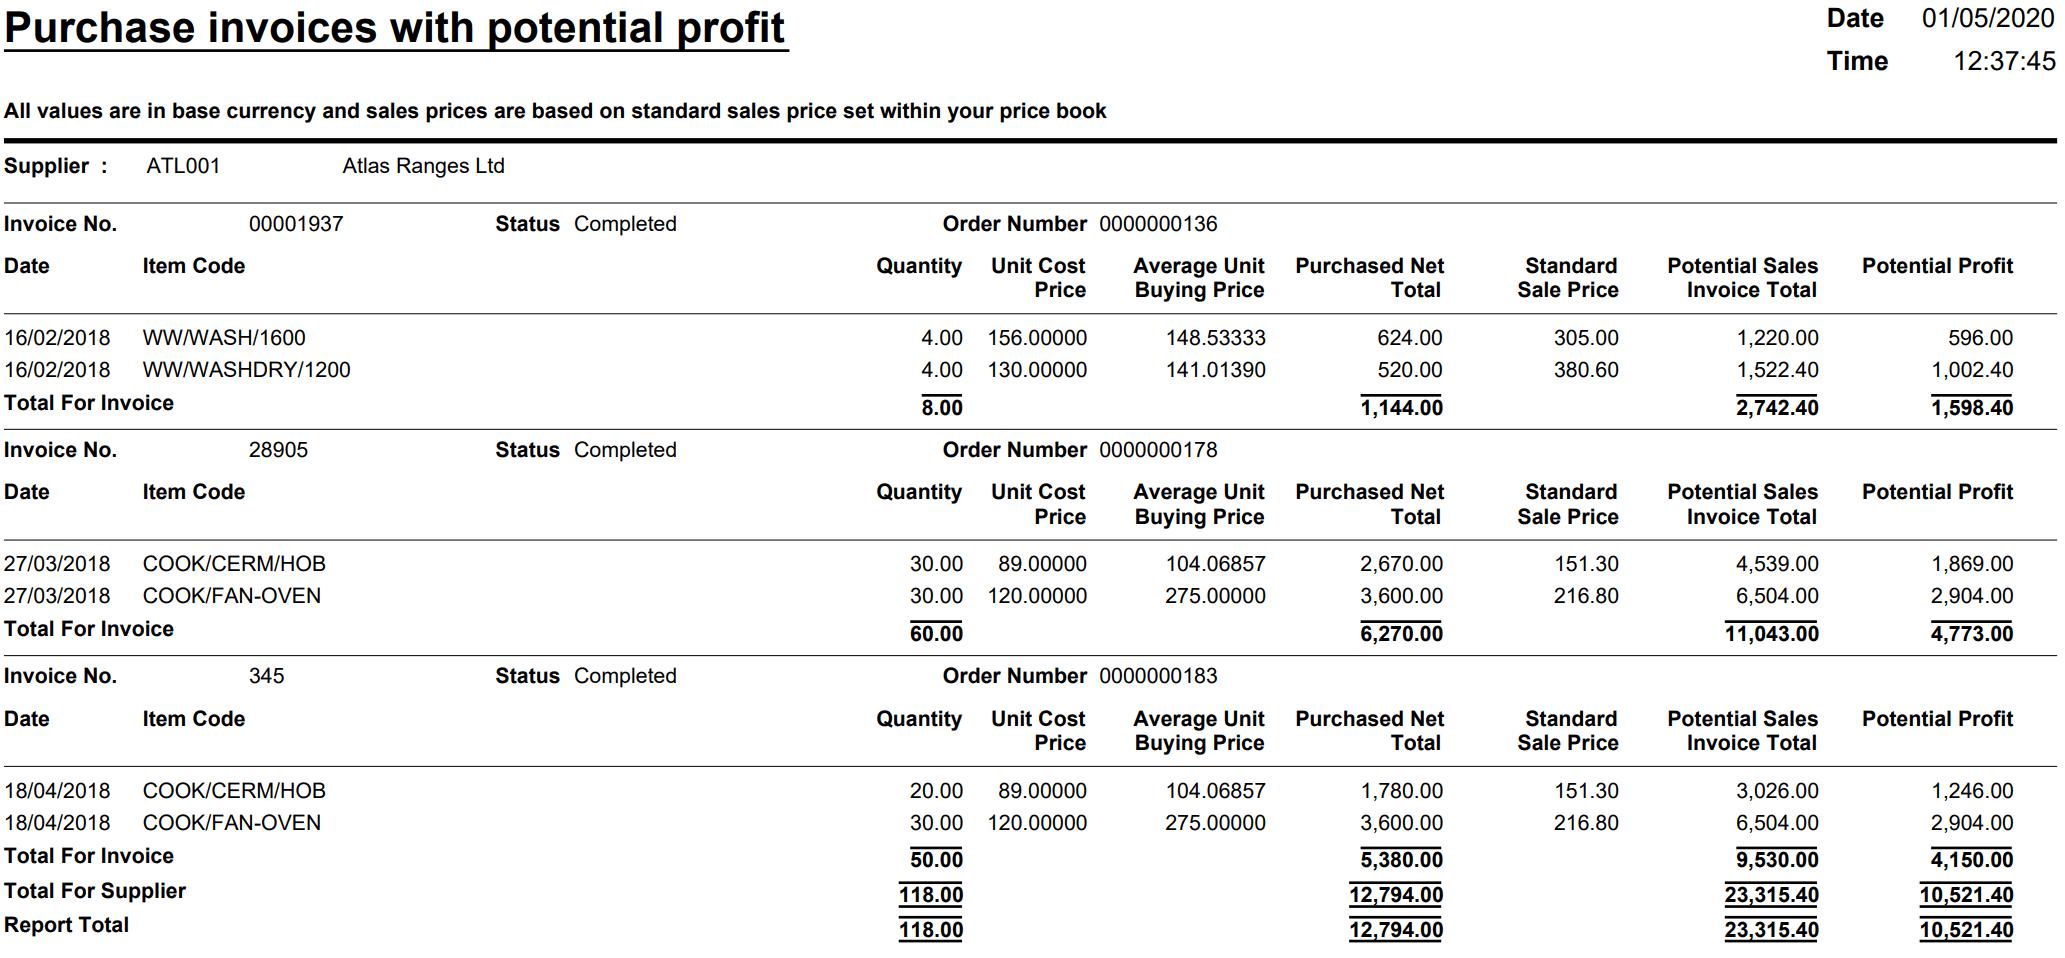 POP Potential Profit by Invoice Report